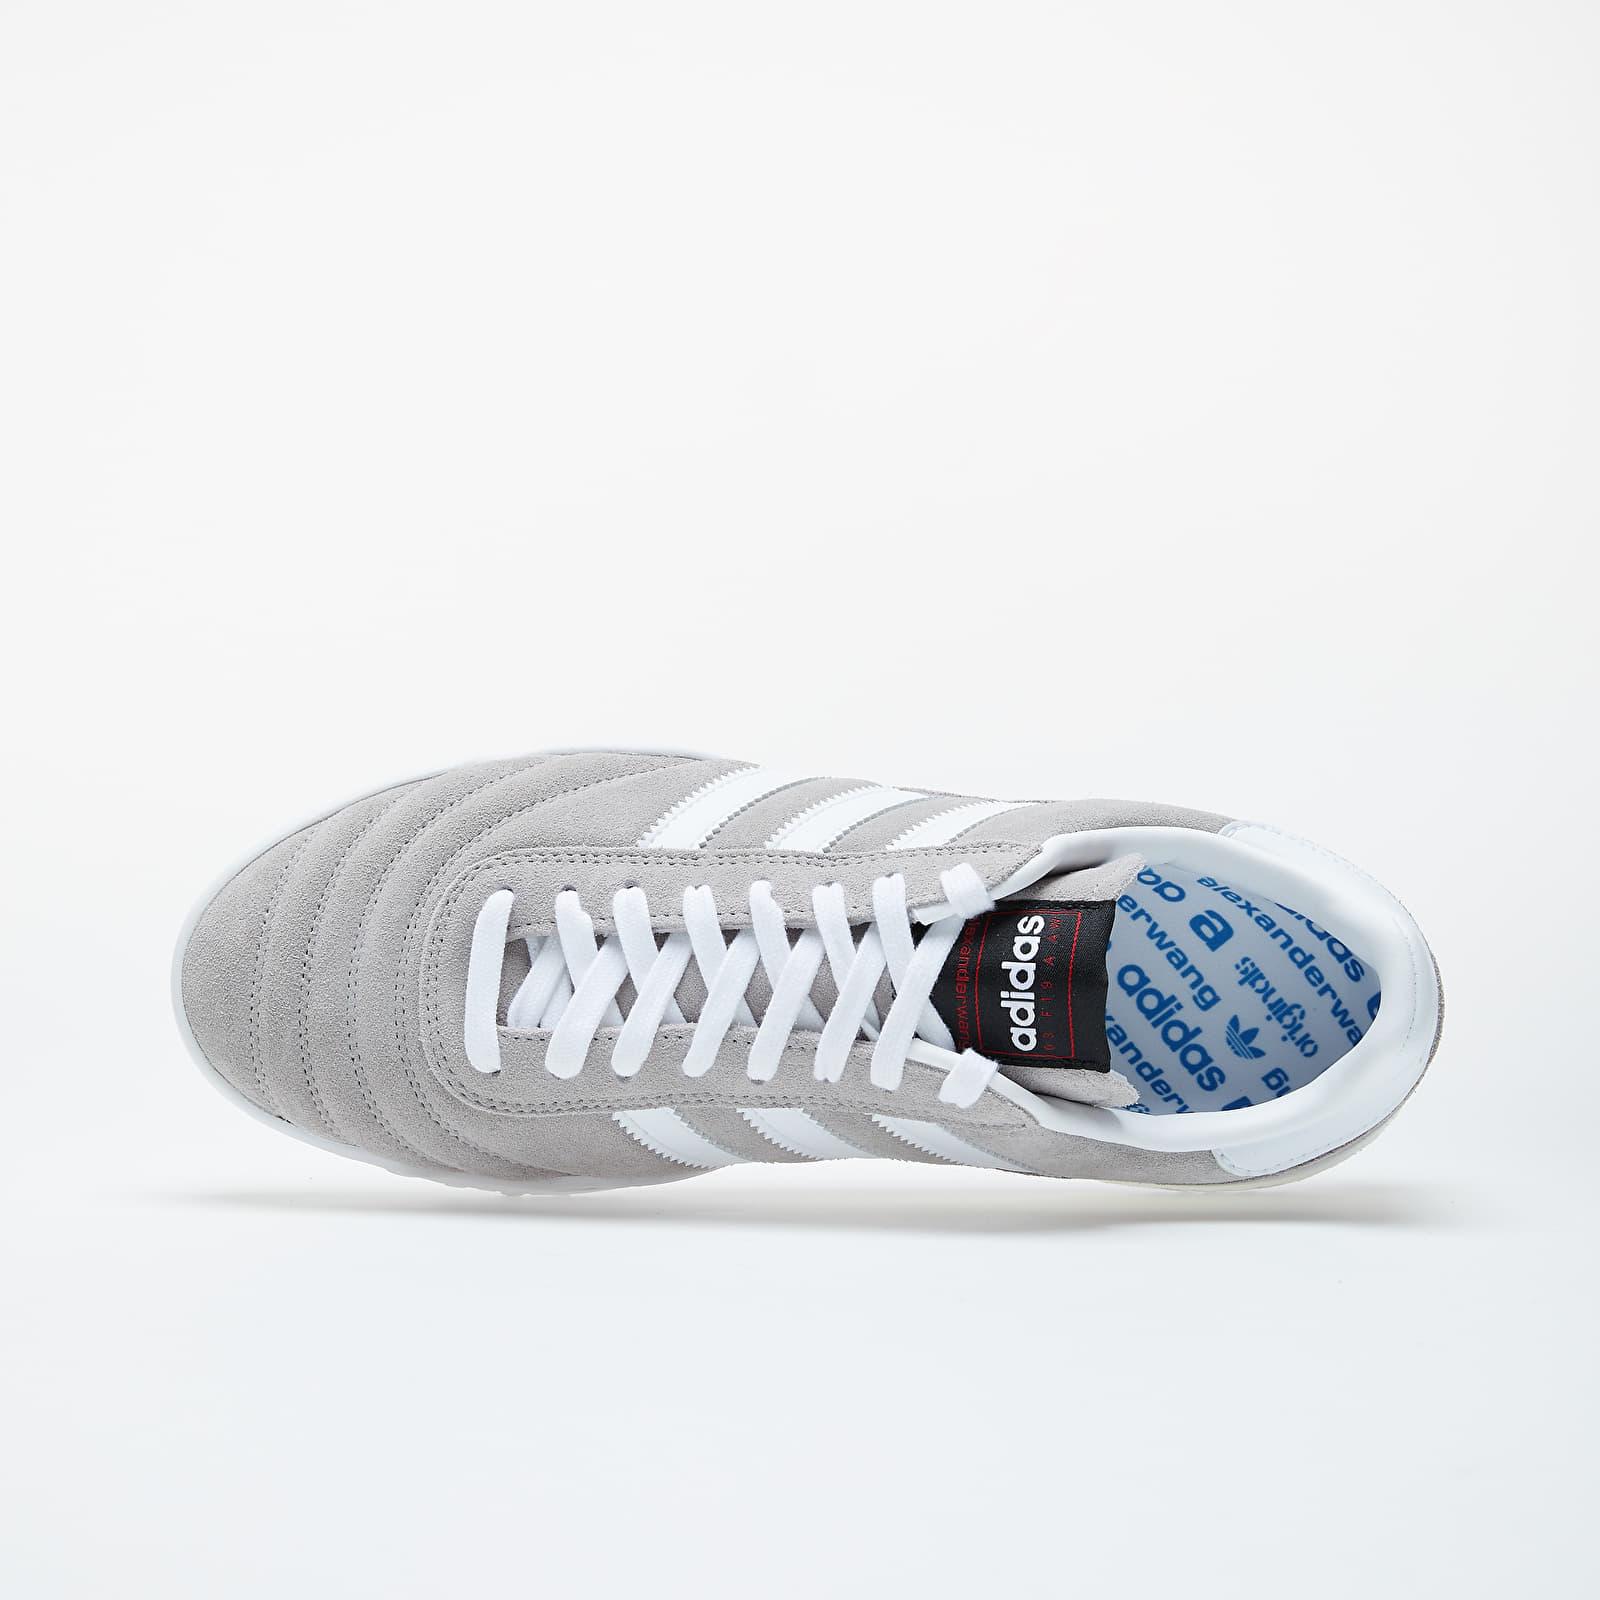 adidas x Alexander Wang Bball SoccerClear Granite Clear Granite Core White